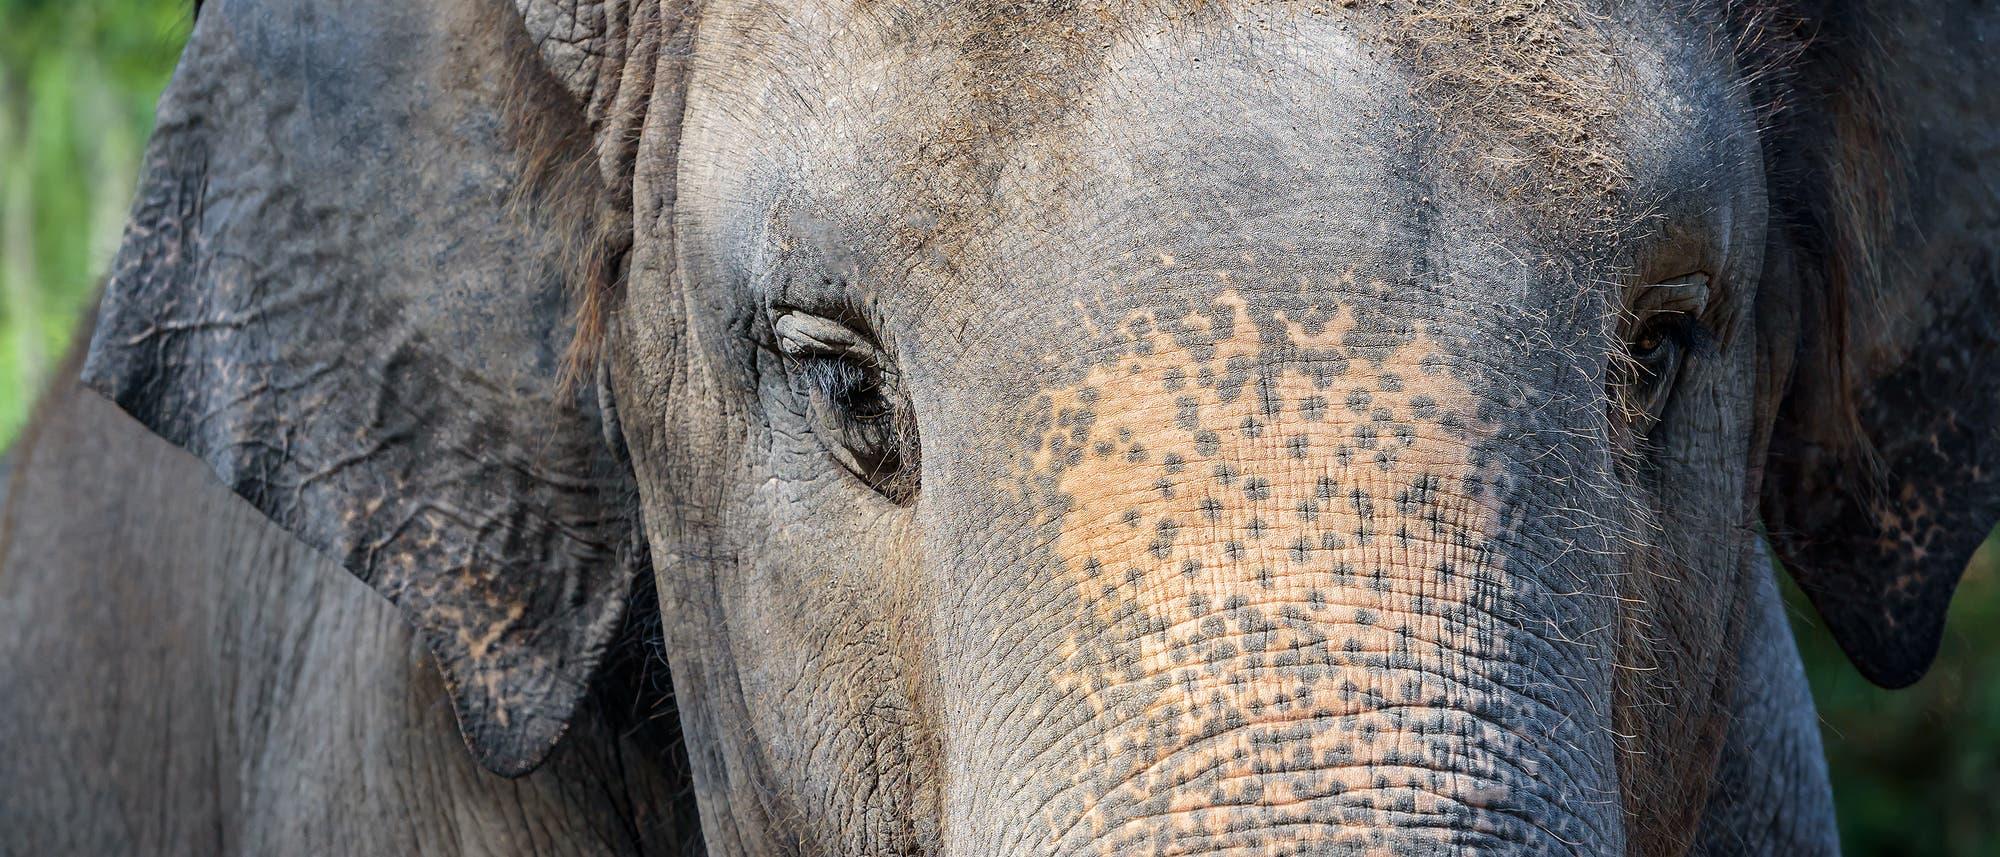 Elefantengesicht frontal fotografiert